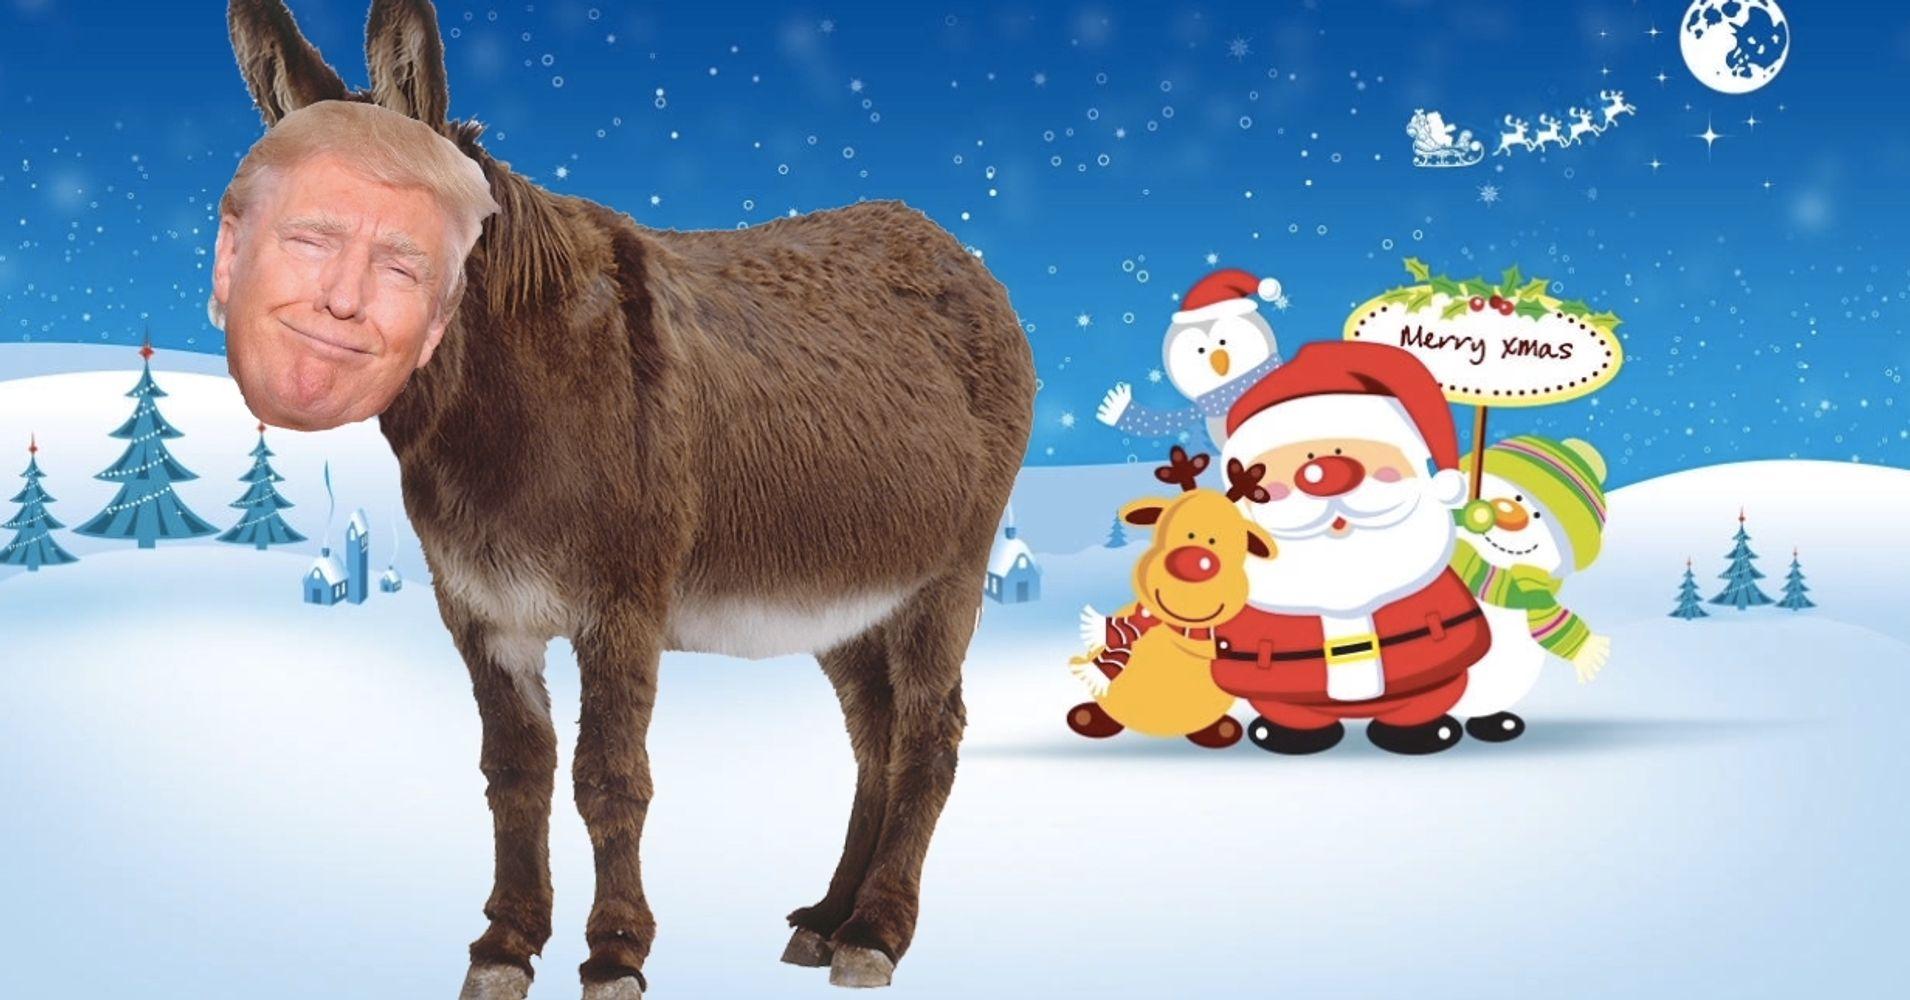 Donald Trump The Donkey Huffpost